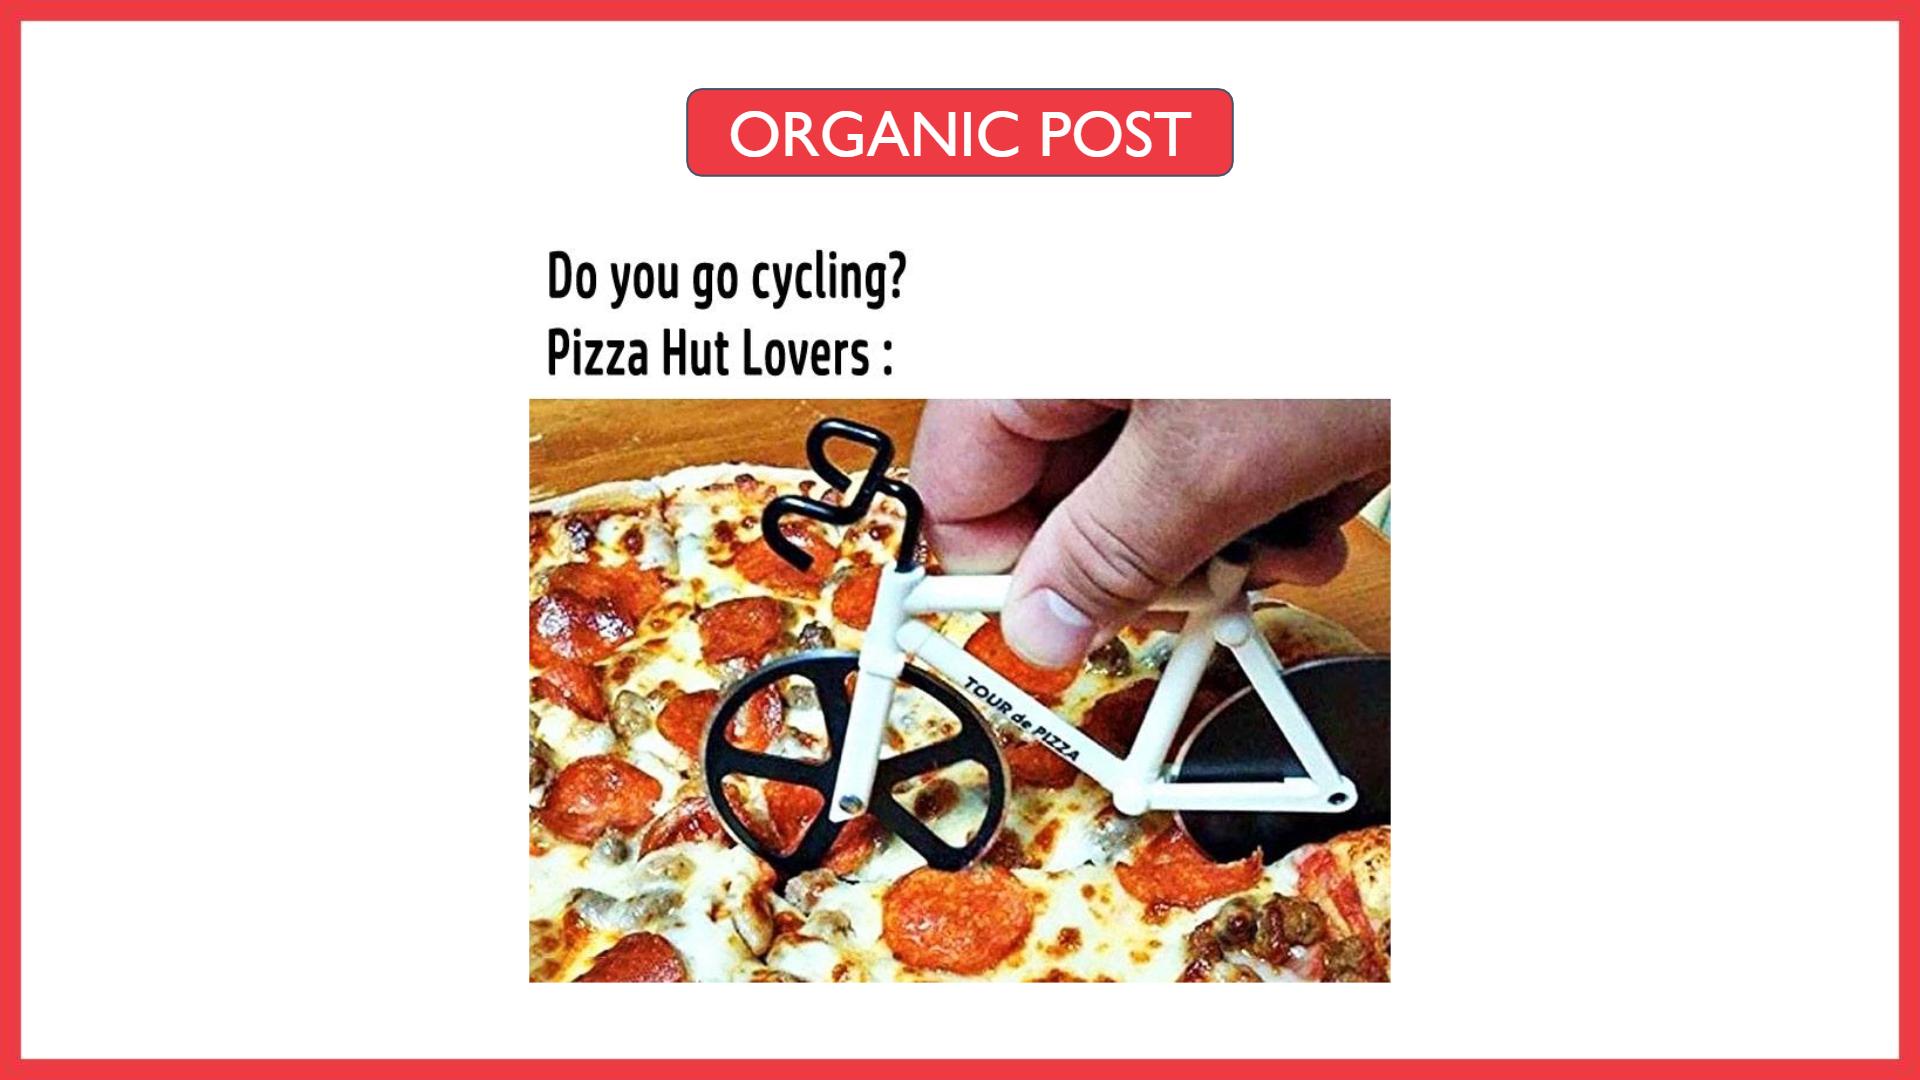 pizza hut marketing strategy Organic post 3 - Pizza Hut Marketing and Advertising Strategy